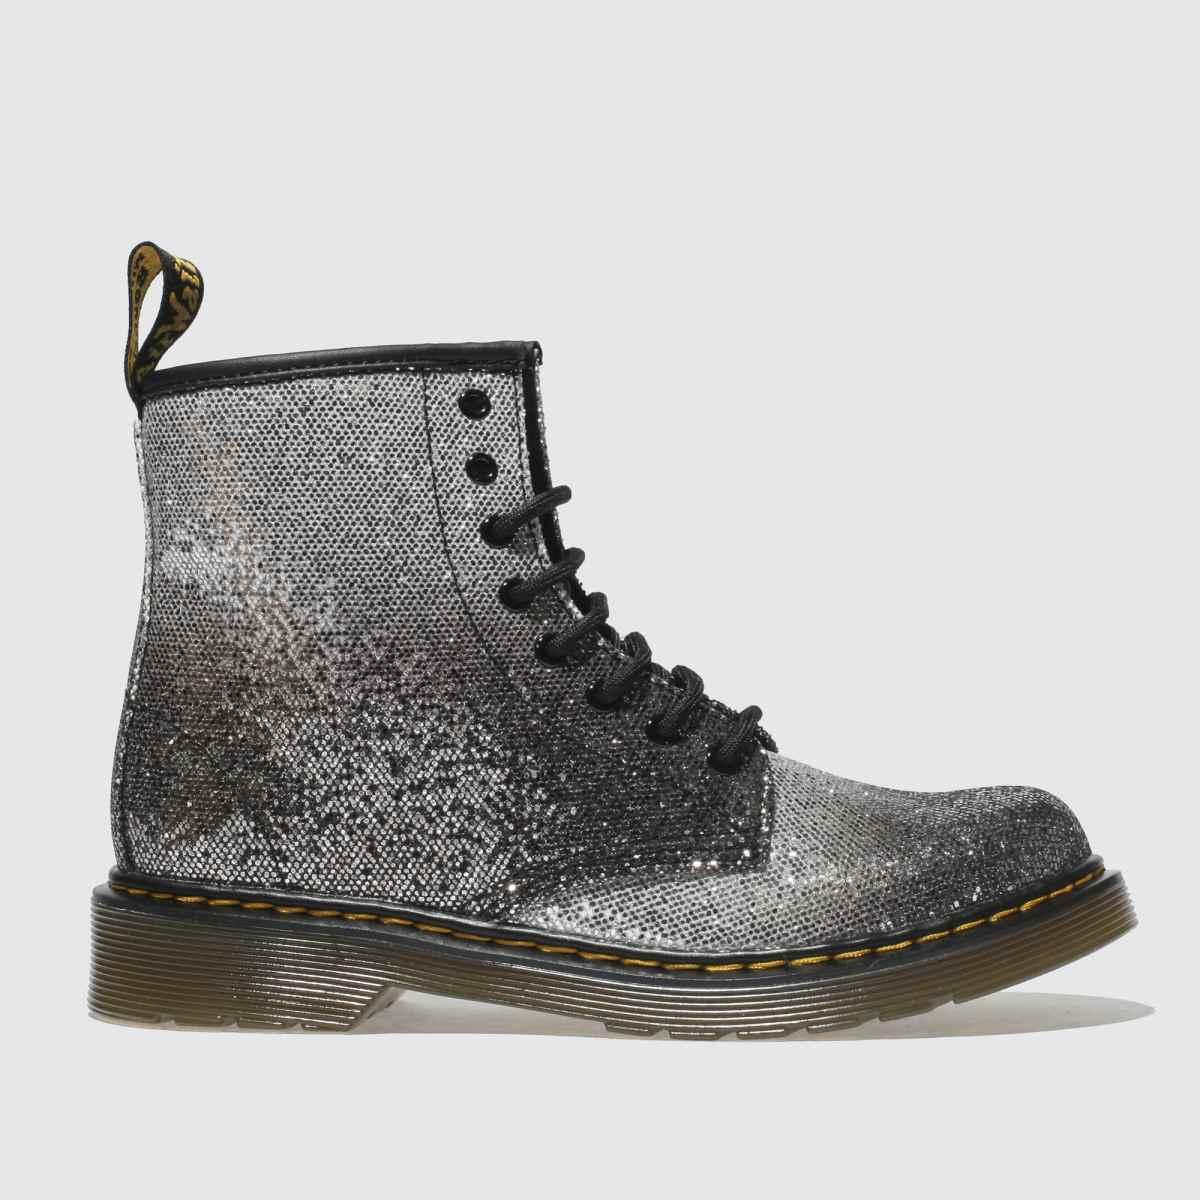 Dr Martens Black & Silver 1460 Glitter Boots Junior